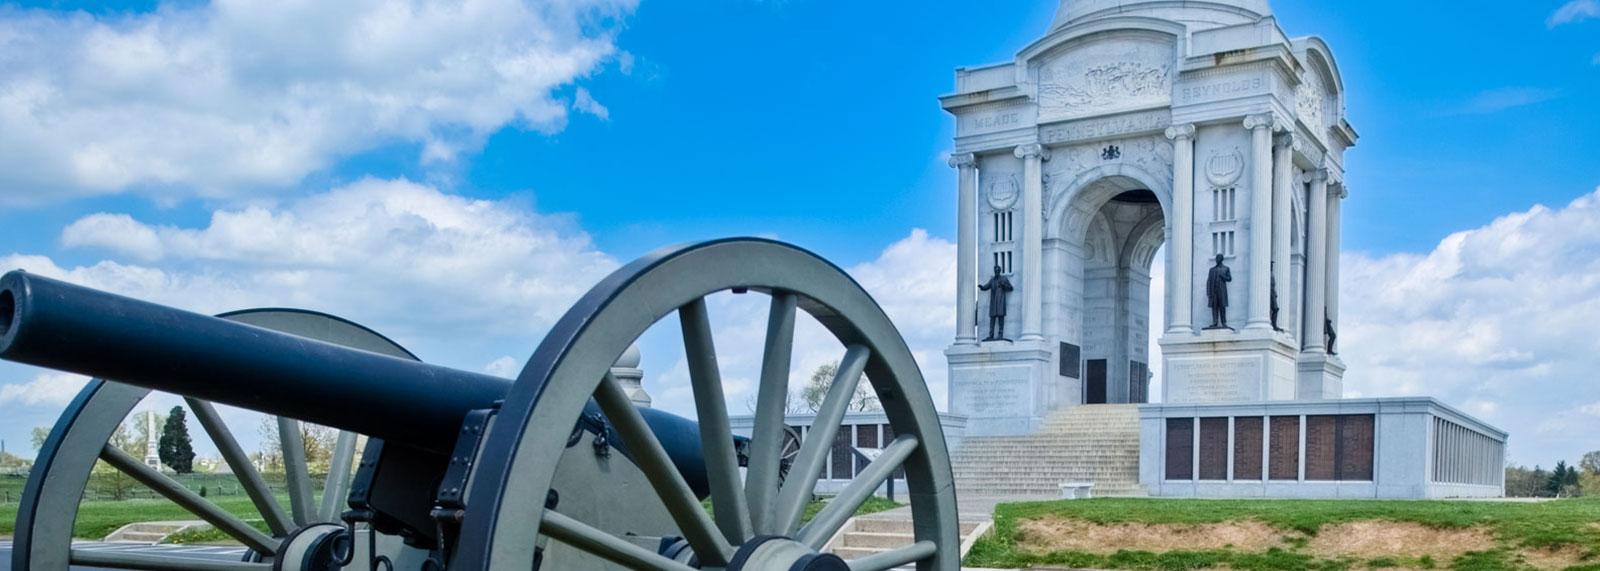 Groups in Quality Inn Gettysburg Battlefield